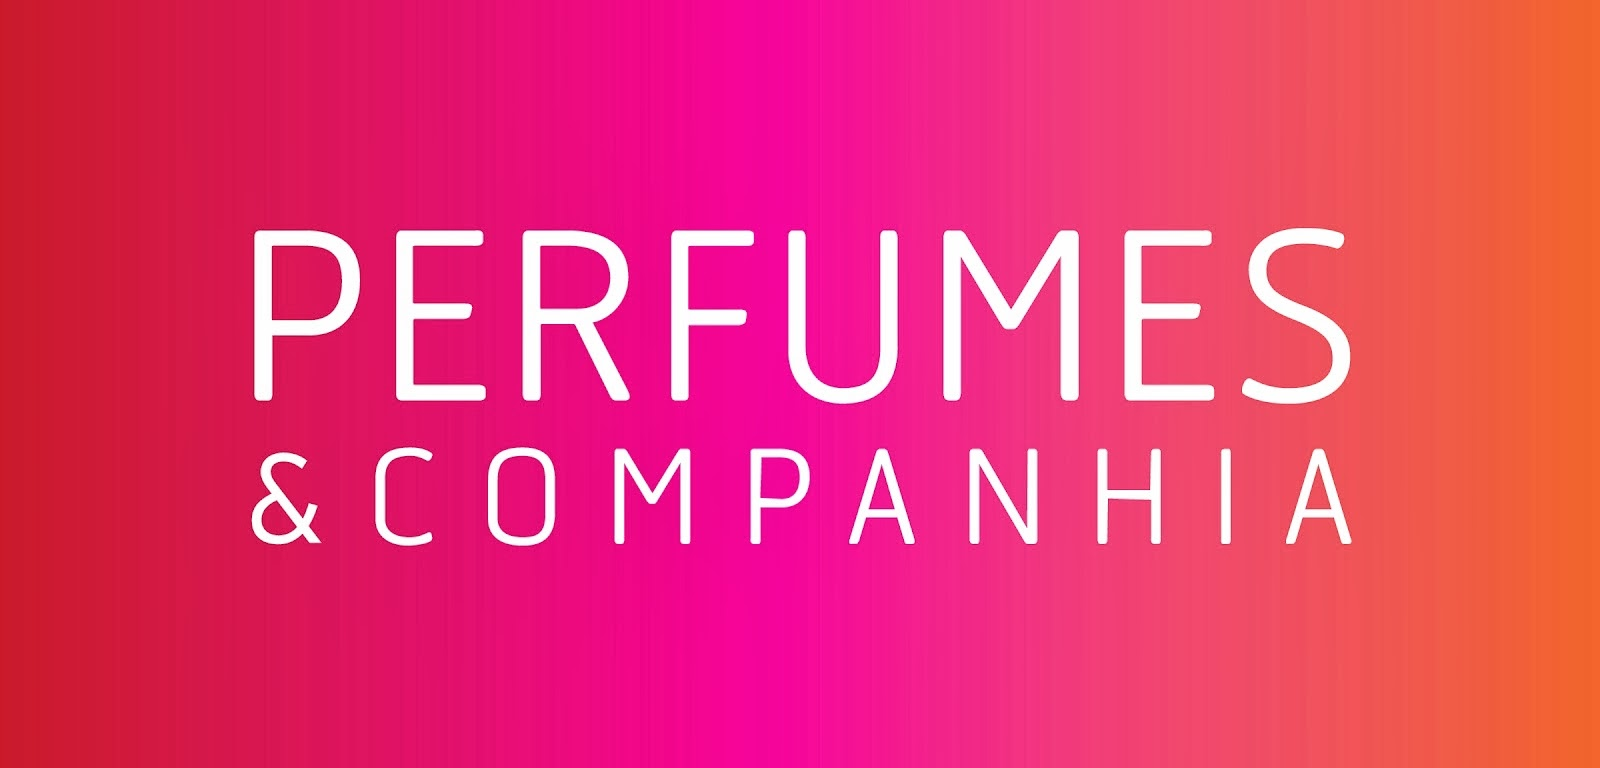 https://www.perfumesecompanhia.pt/pt/catalogo/maquilhagem/unhas/cor-vernizes/kit-vernizes-anny-18611/